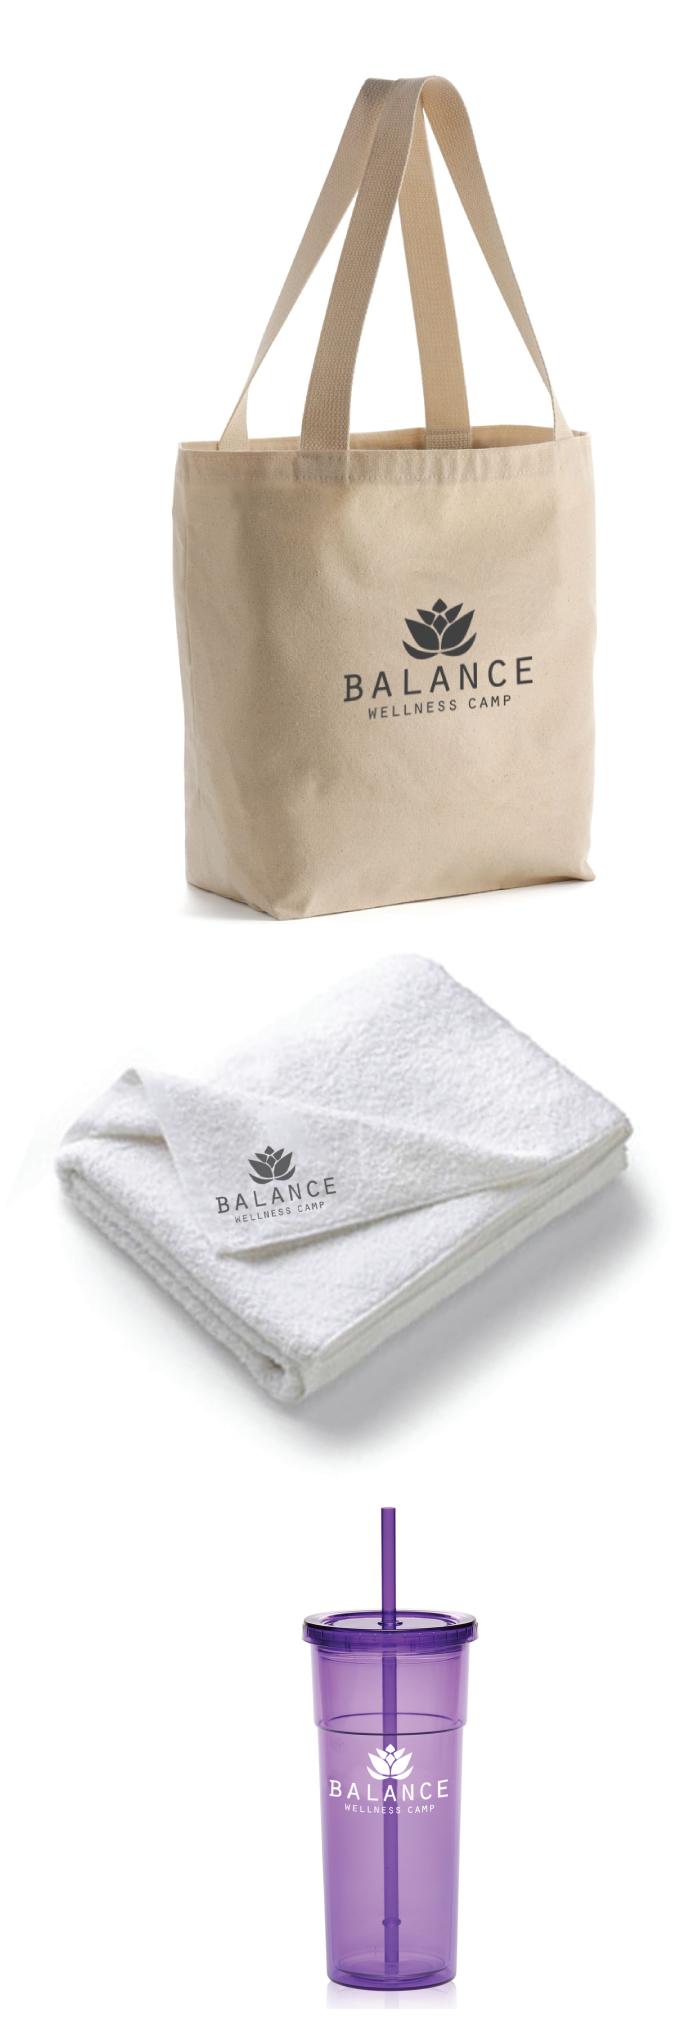 balance-camp-gifts.png